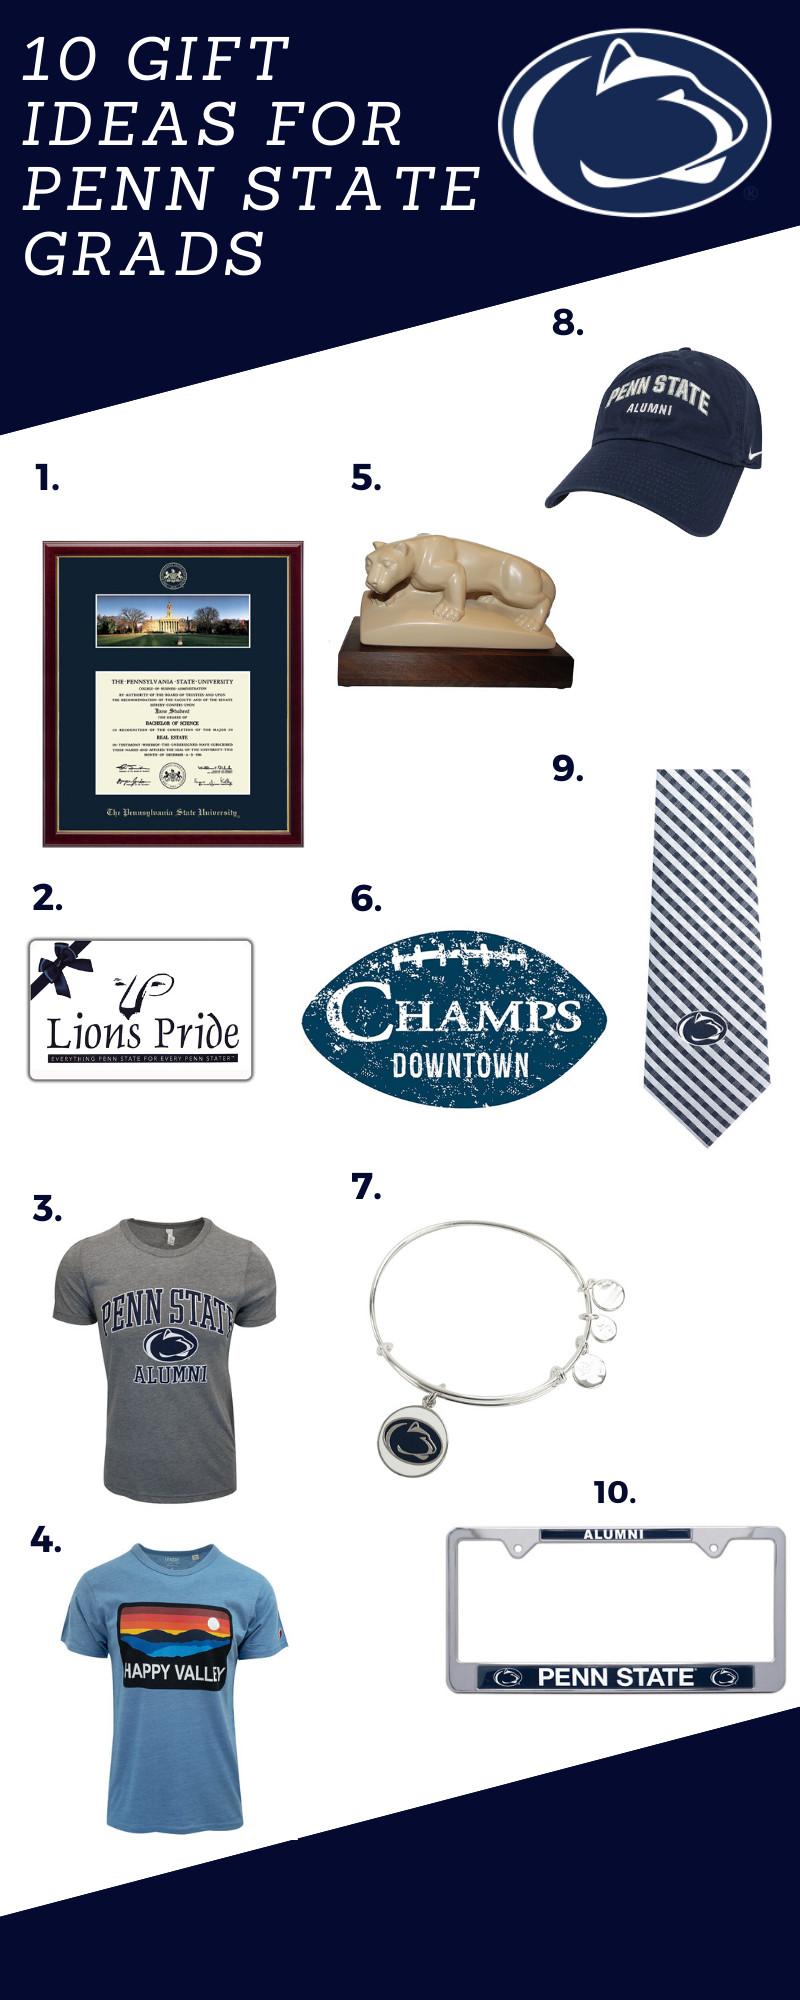 Penn State Graduation Gift Ideas  Penn State Graduation Gift Ideas Lions Pride